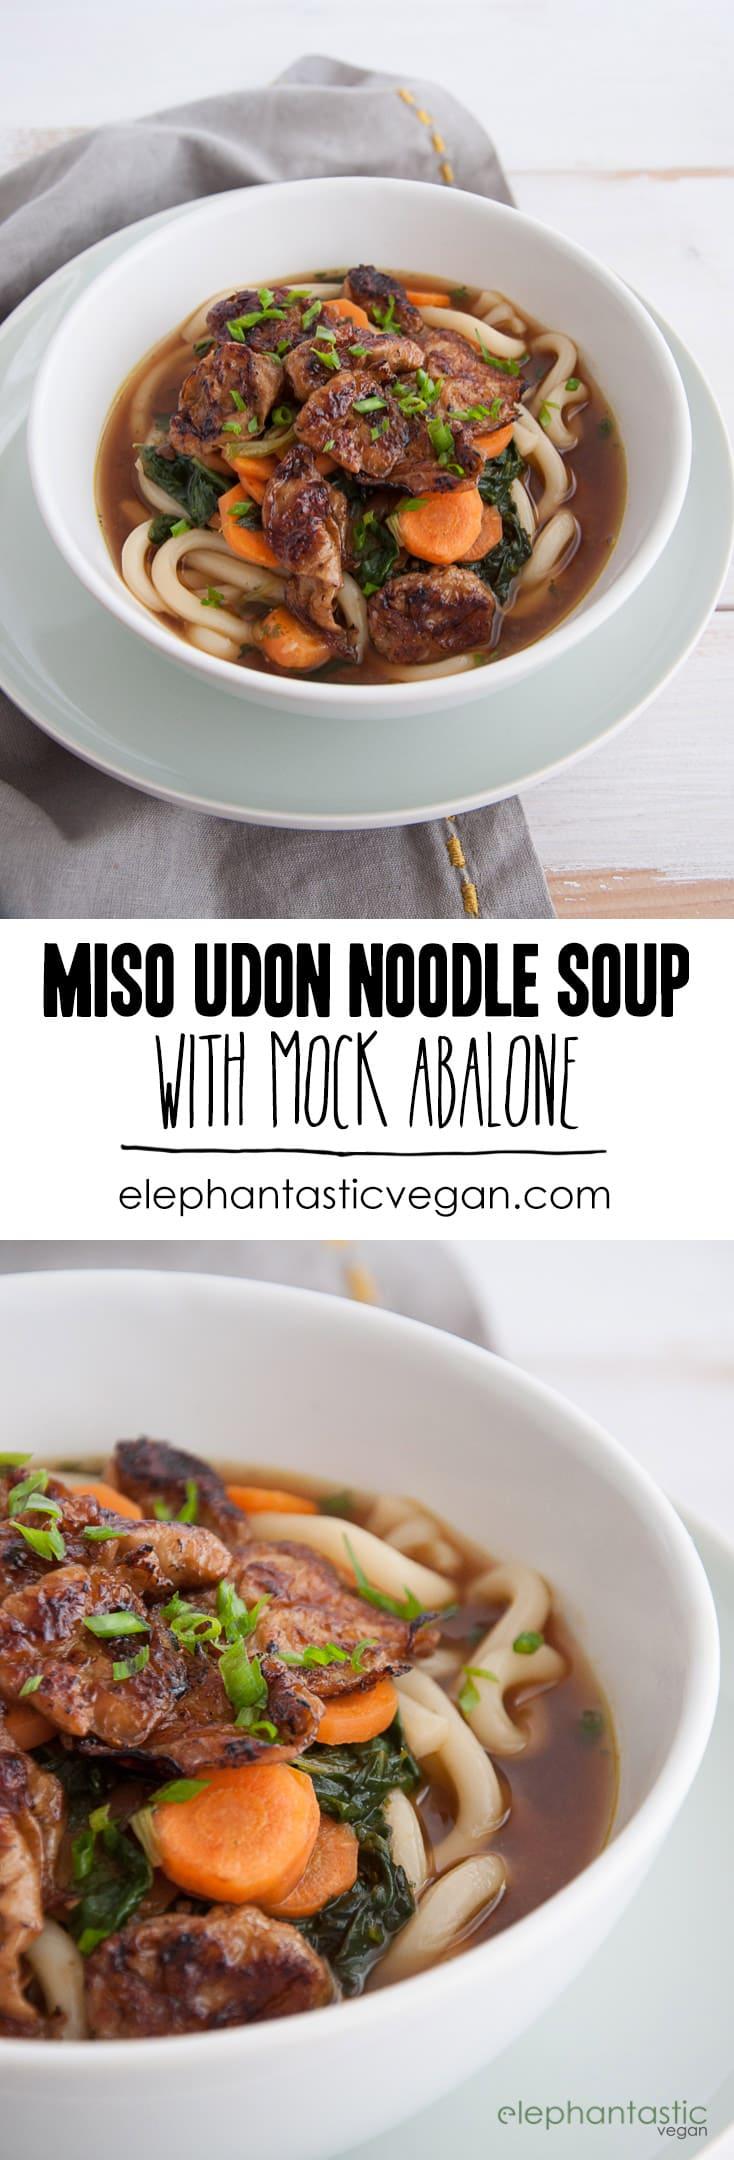 Miso Udon Noodle Soup with Mock Abalone   ElephantasticVegan.com